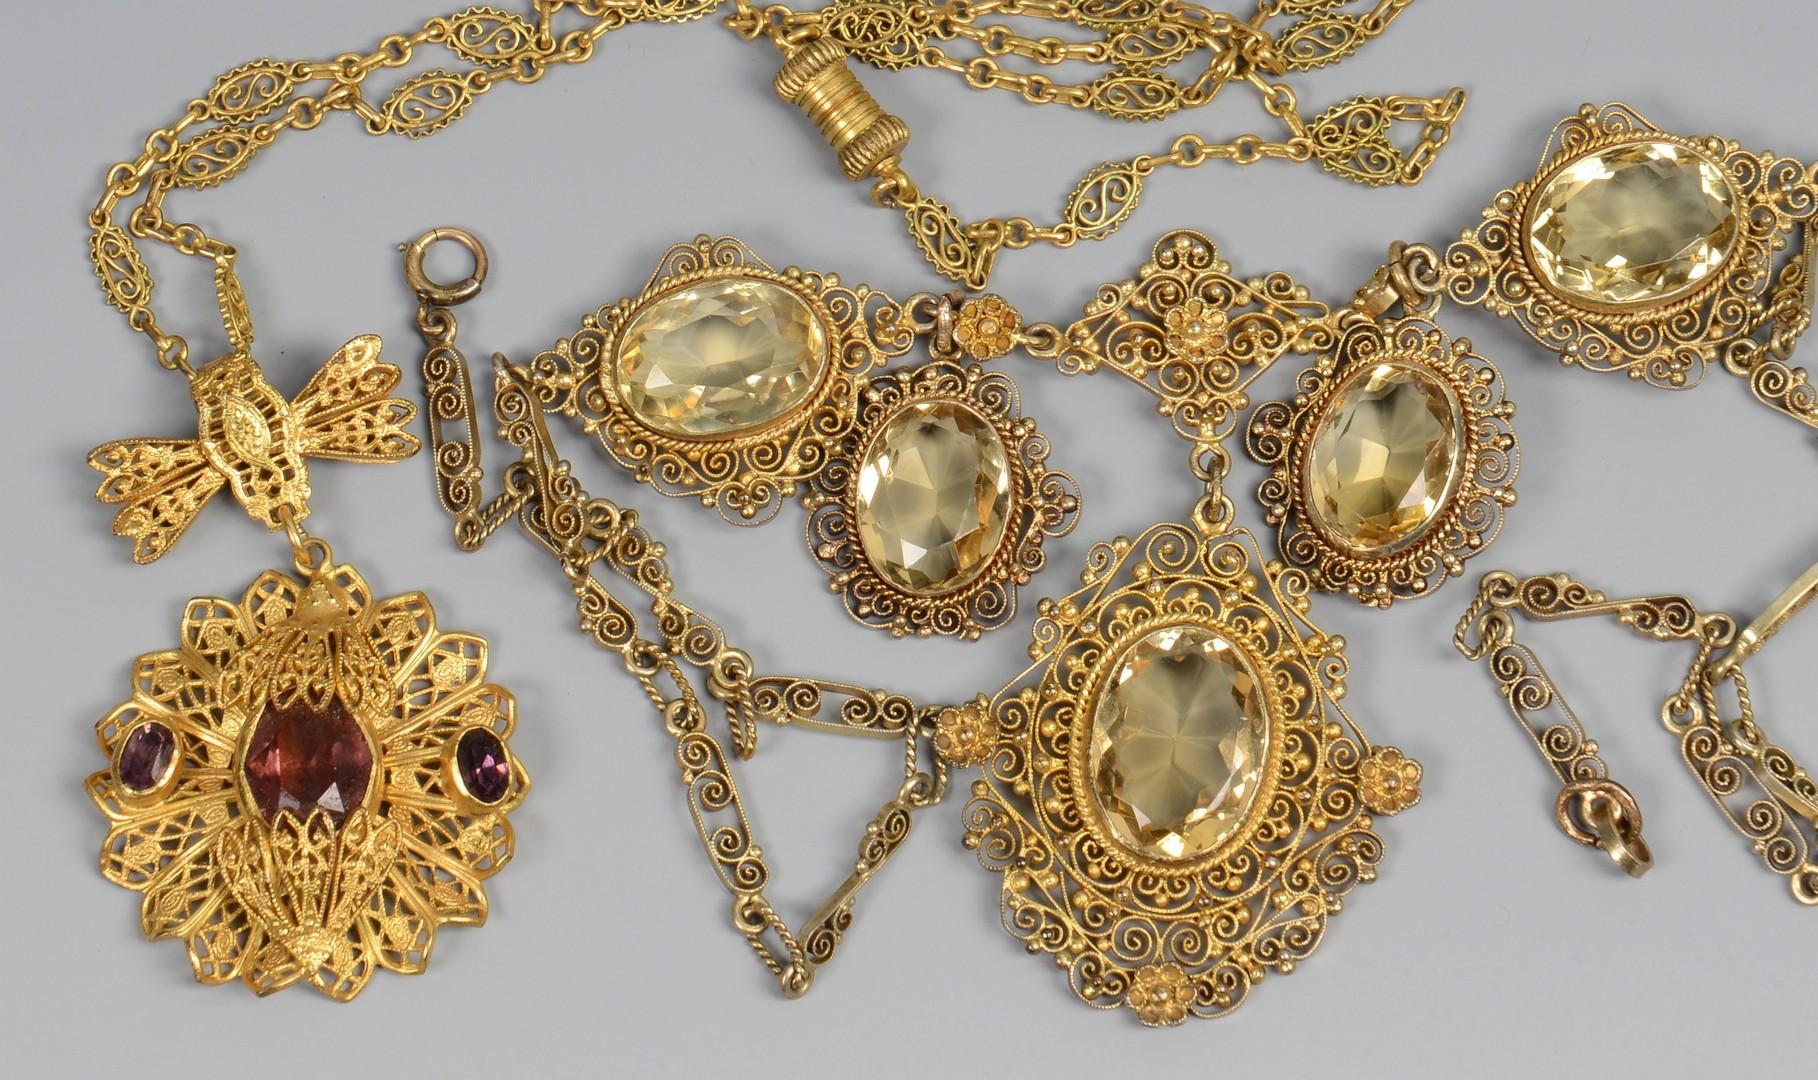 Lot 666: Vintage Filigree Jewelry & Cameos, 5 pcs